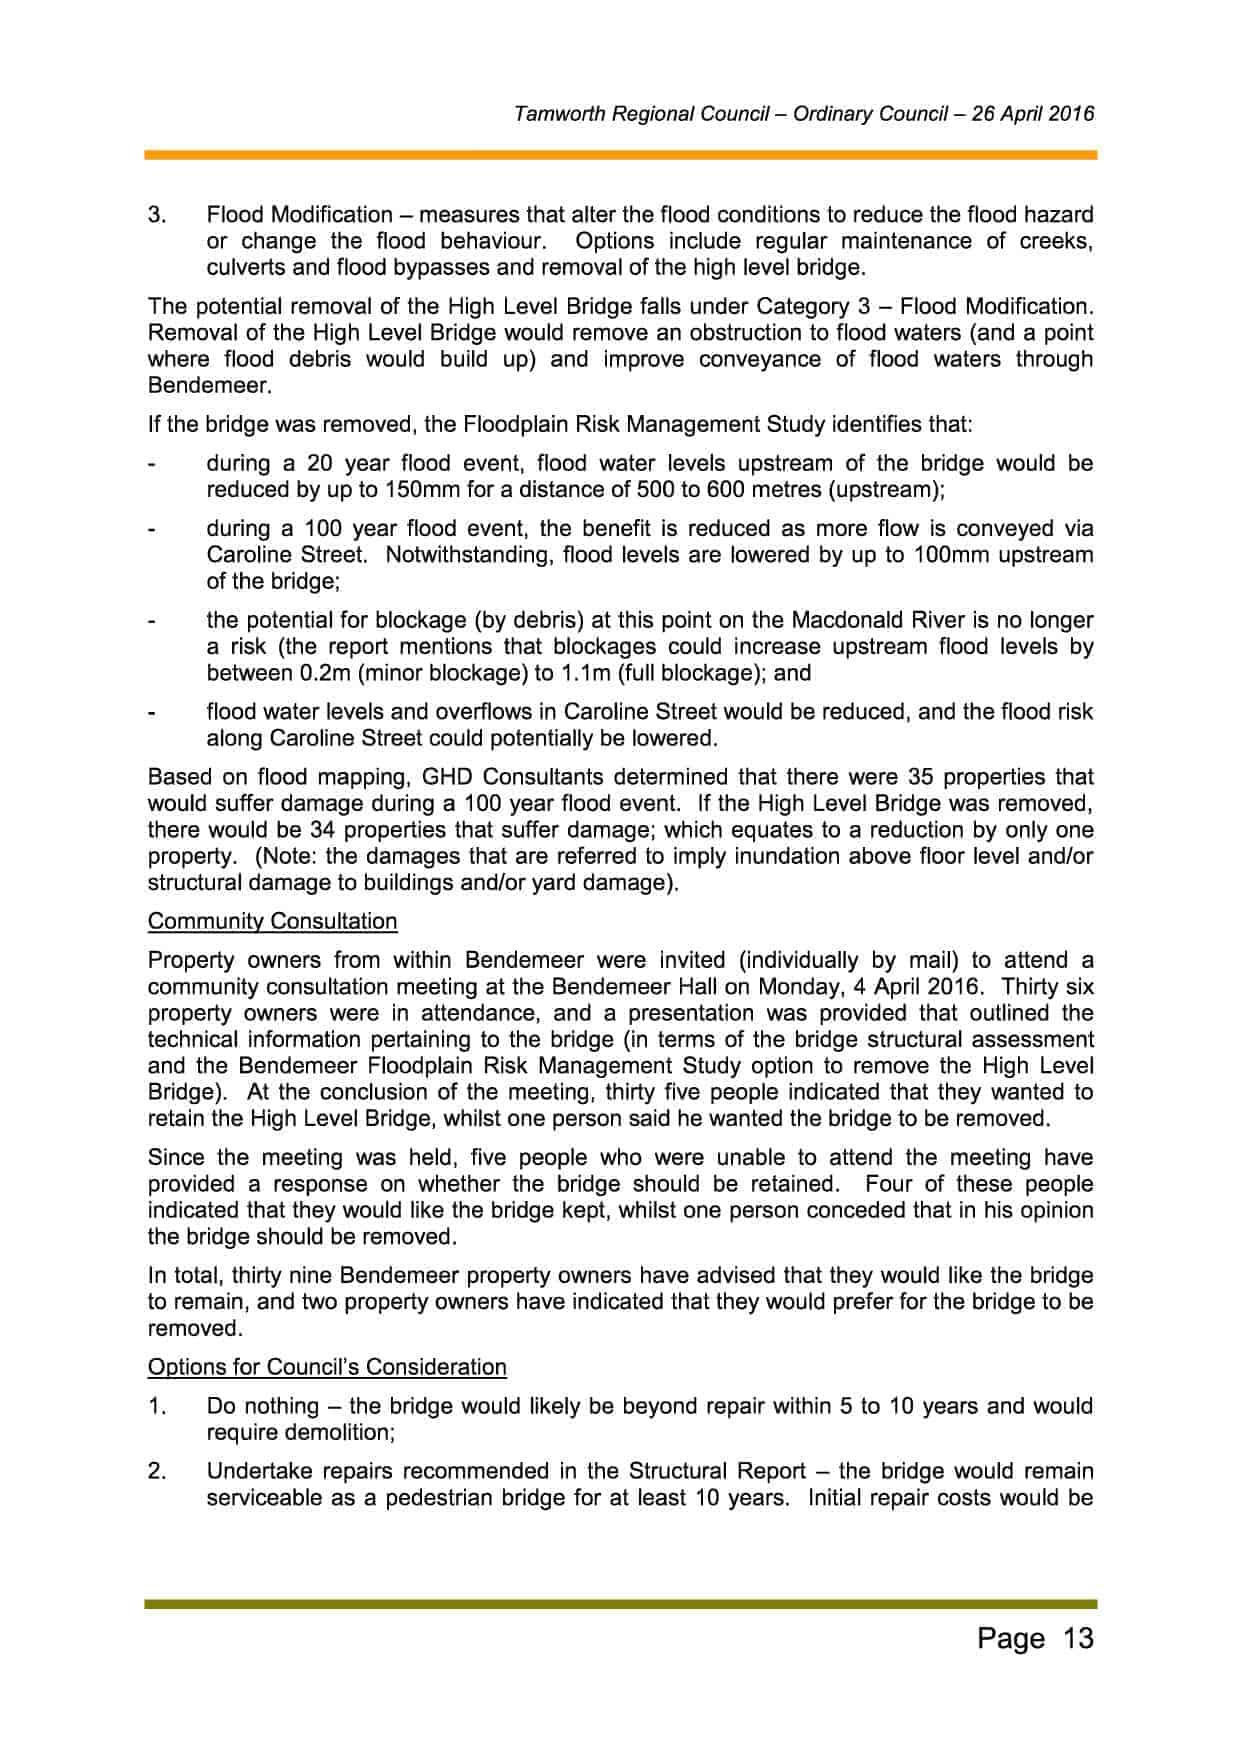 Business Paper - Ordinary Council Meeting 26 April 2016 v23